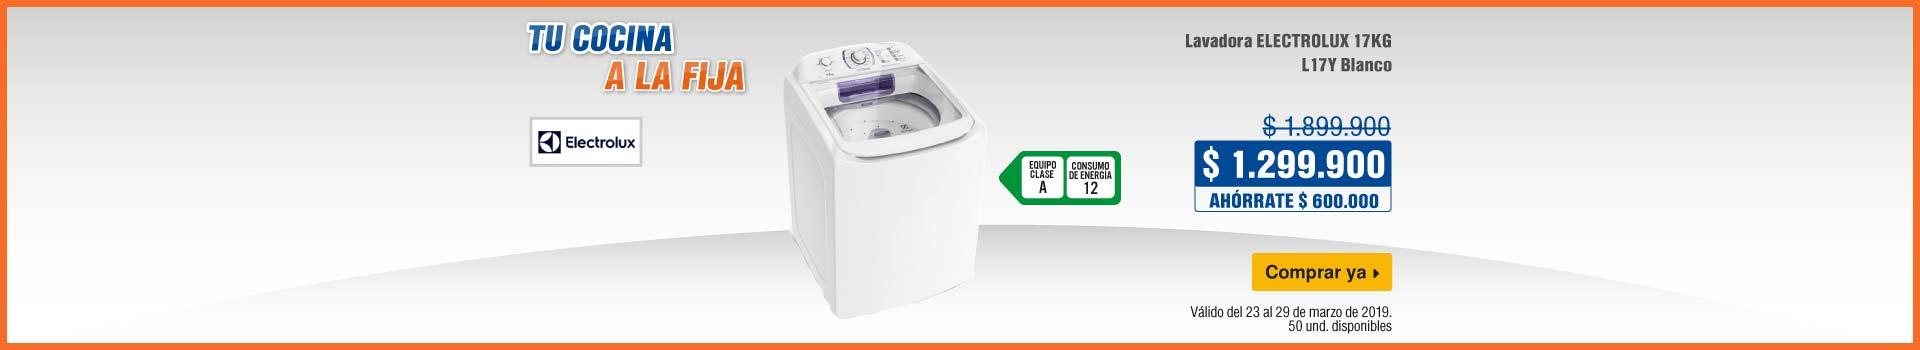 AK-KT-mayores-3-ELECT-BCAT-lavadoras-electrolux-230319